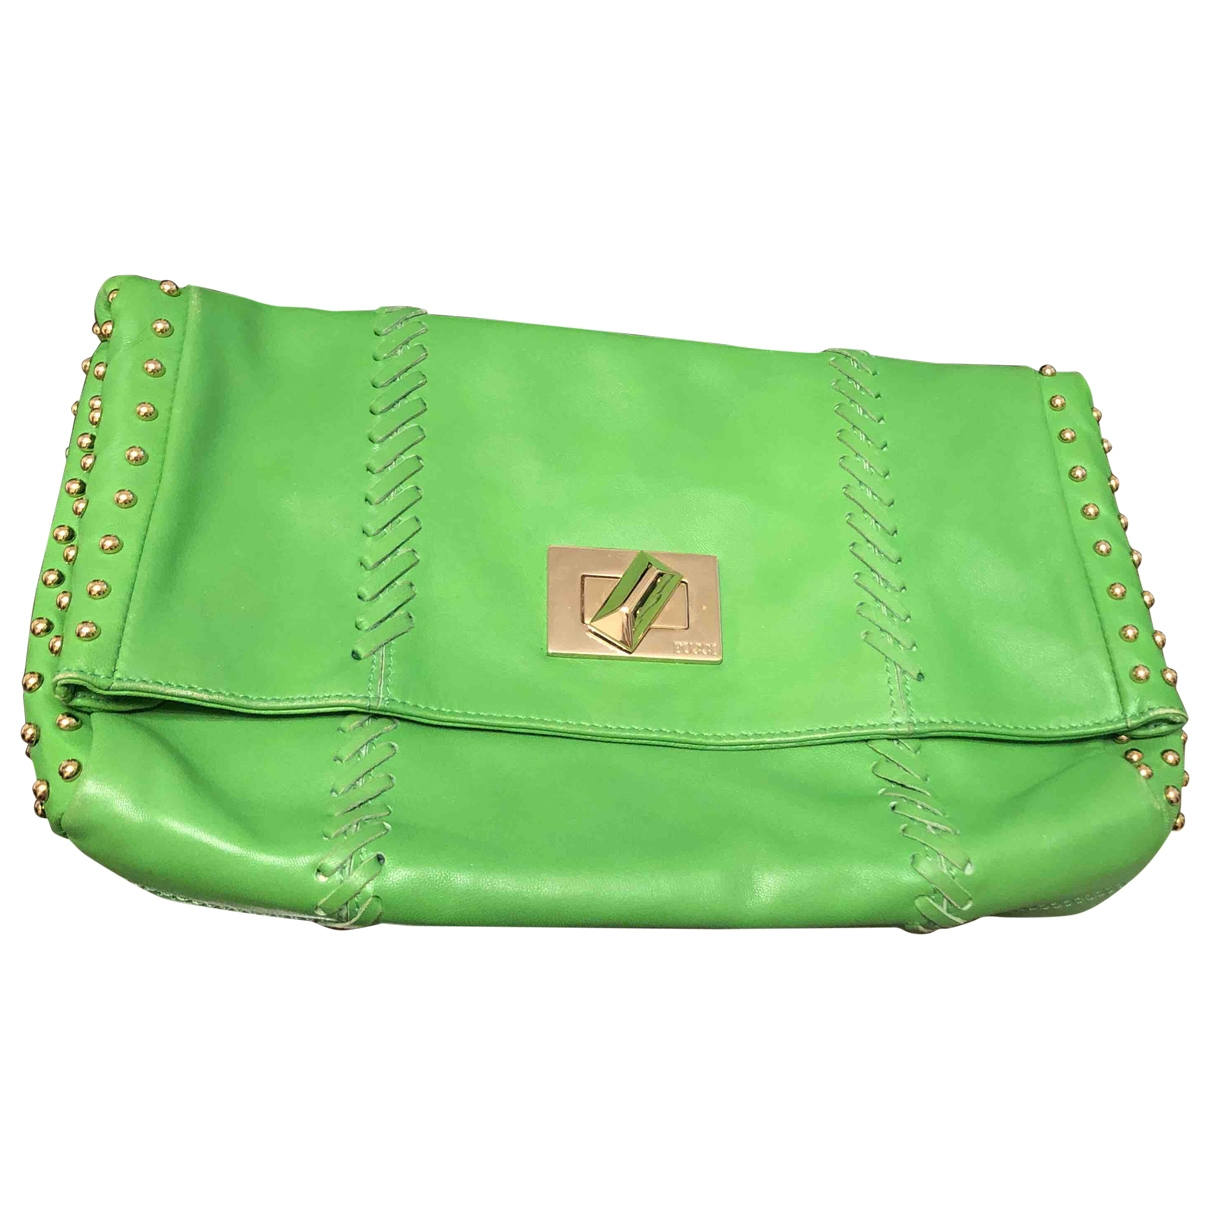 Emilio Pucci \N Green Leather Clutch bag for Women \N